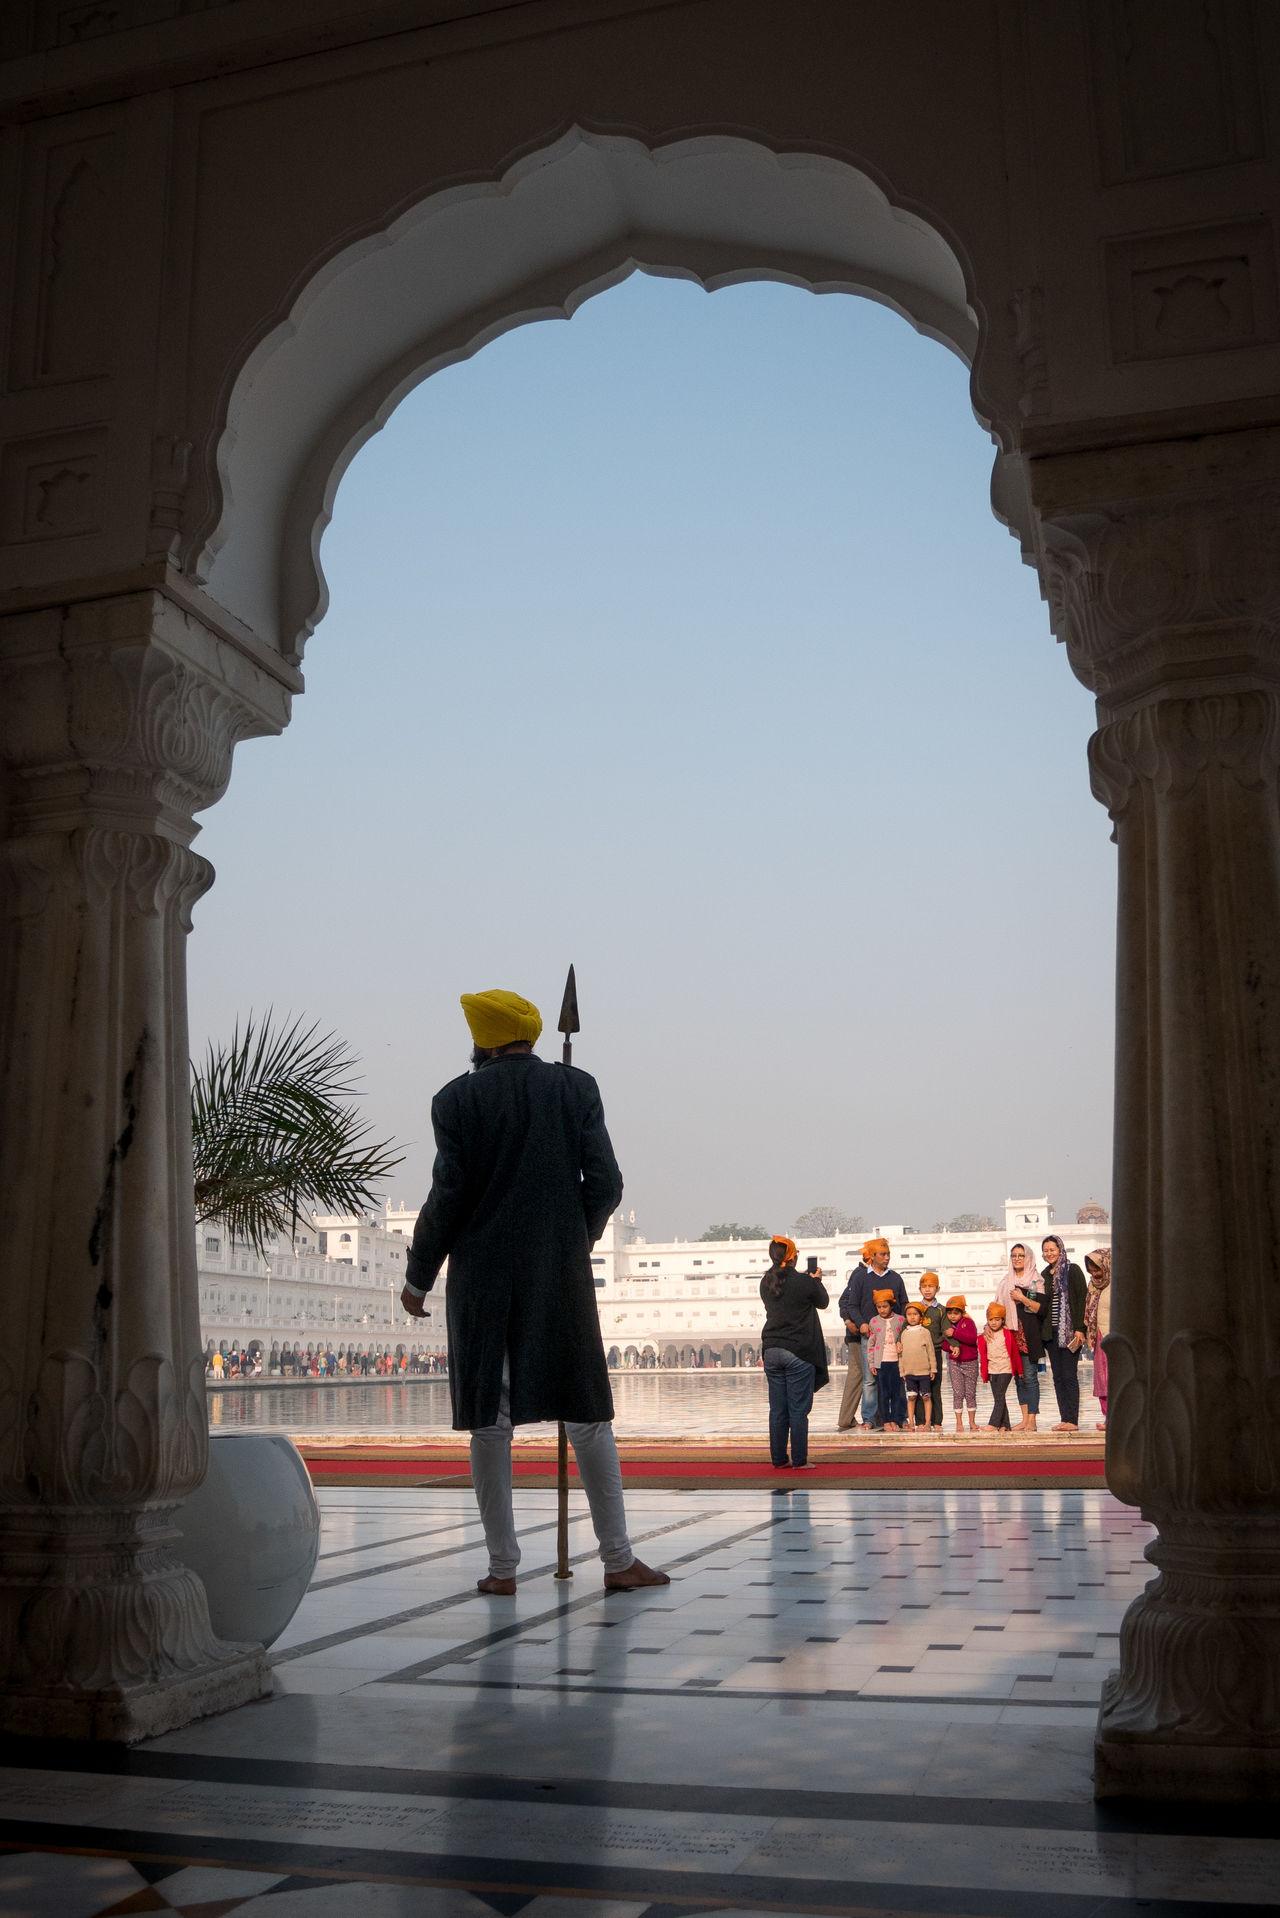 Guard in the Golden Temple, Amritsar, India Amritsar Arch Architecture Golden Golden Temple Guard Gurdwara Harmandir Sahib India Punjab Religion Security Sikh Sikh Temple Sikhism Sunlight Temple Travel Travel Destinations Worship